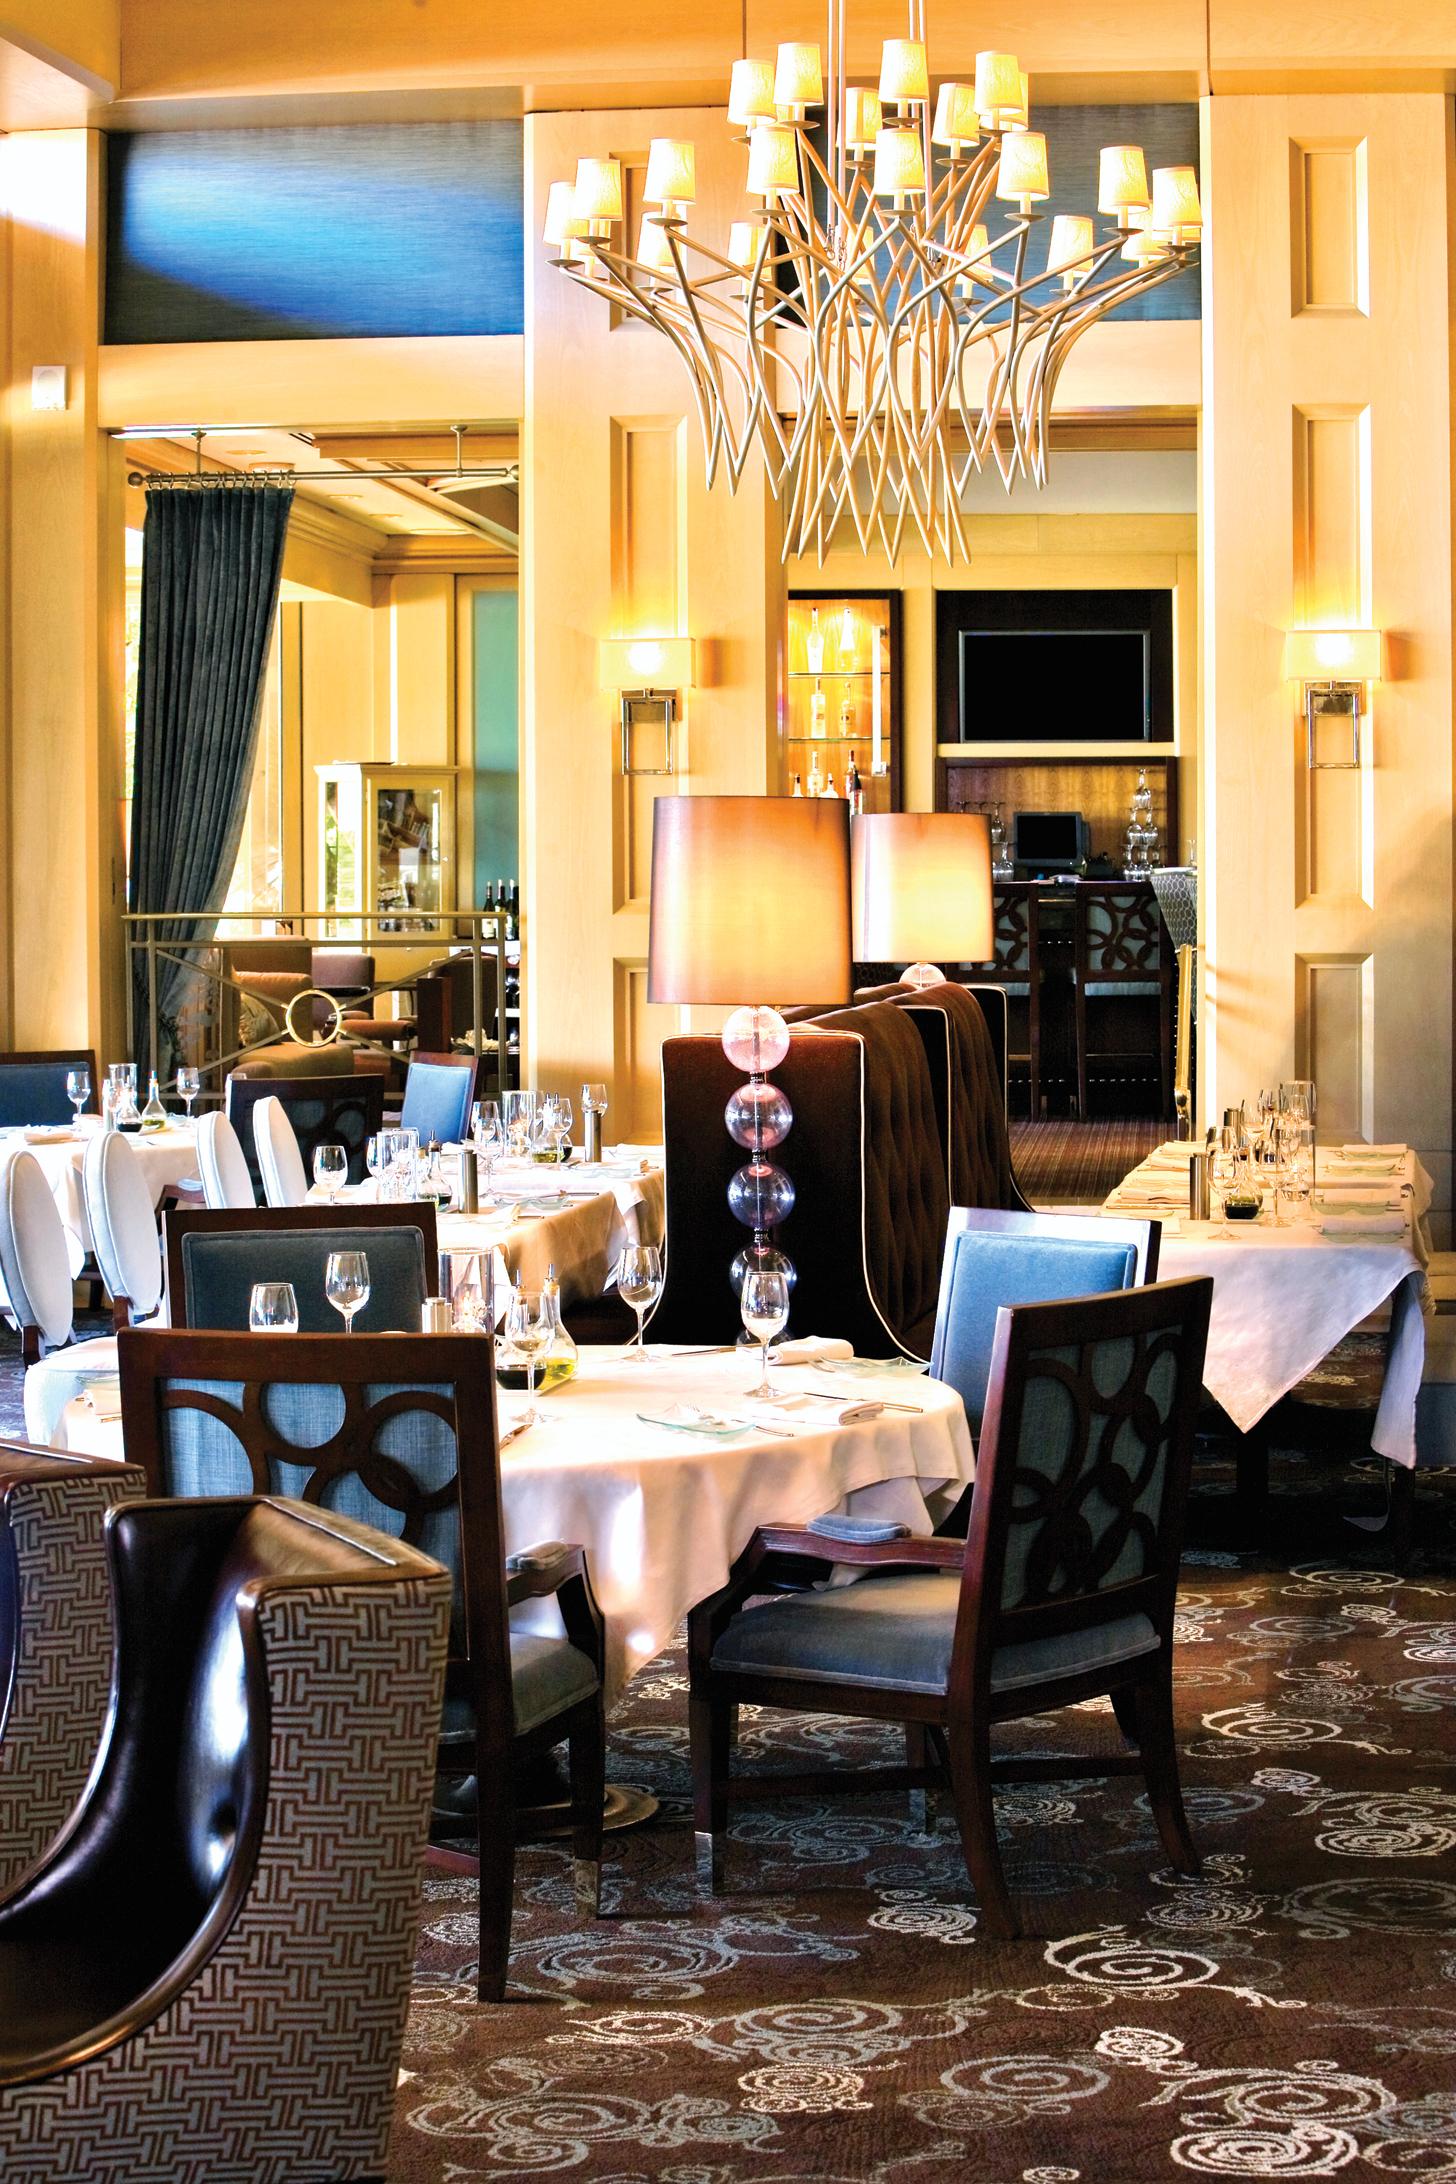 Detalhe do restaurante Il Terrazzo, de especialidade italiana